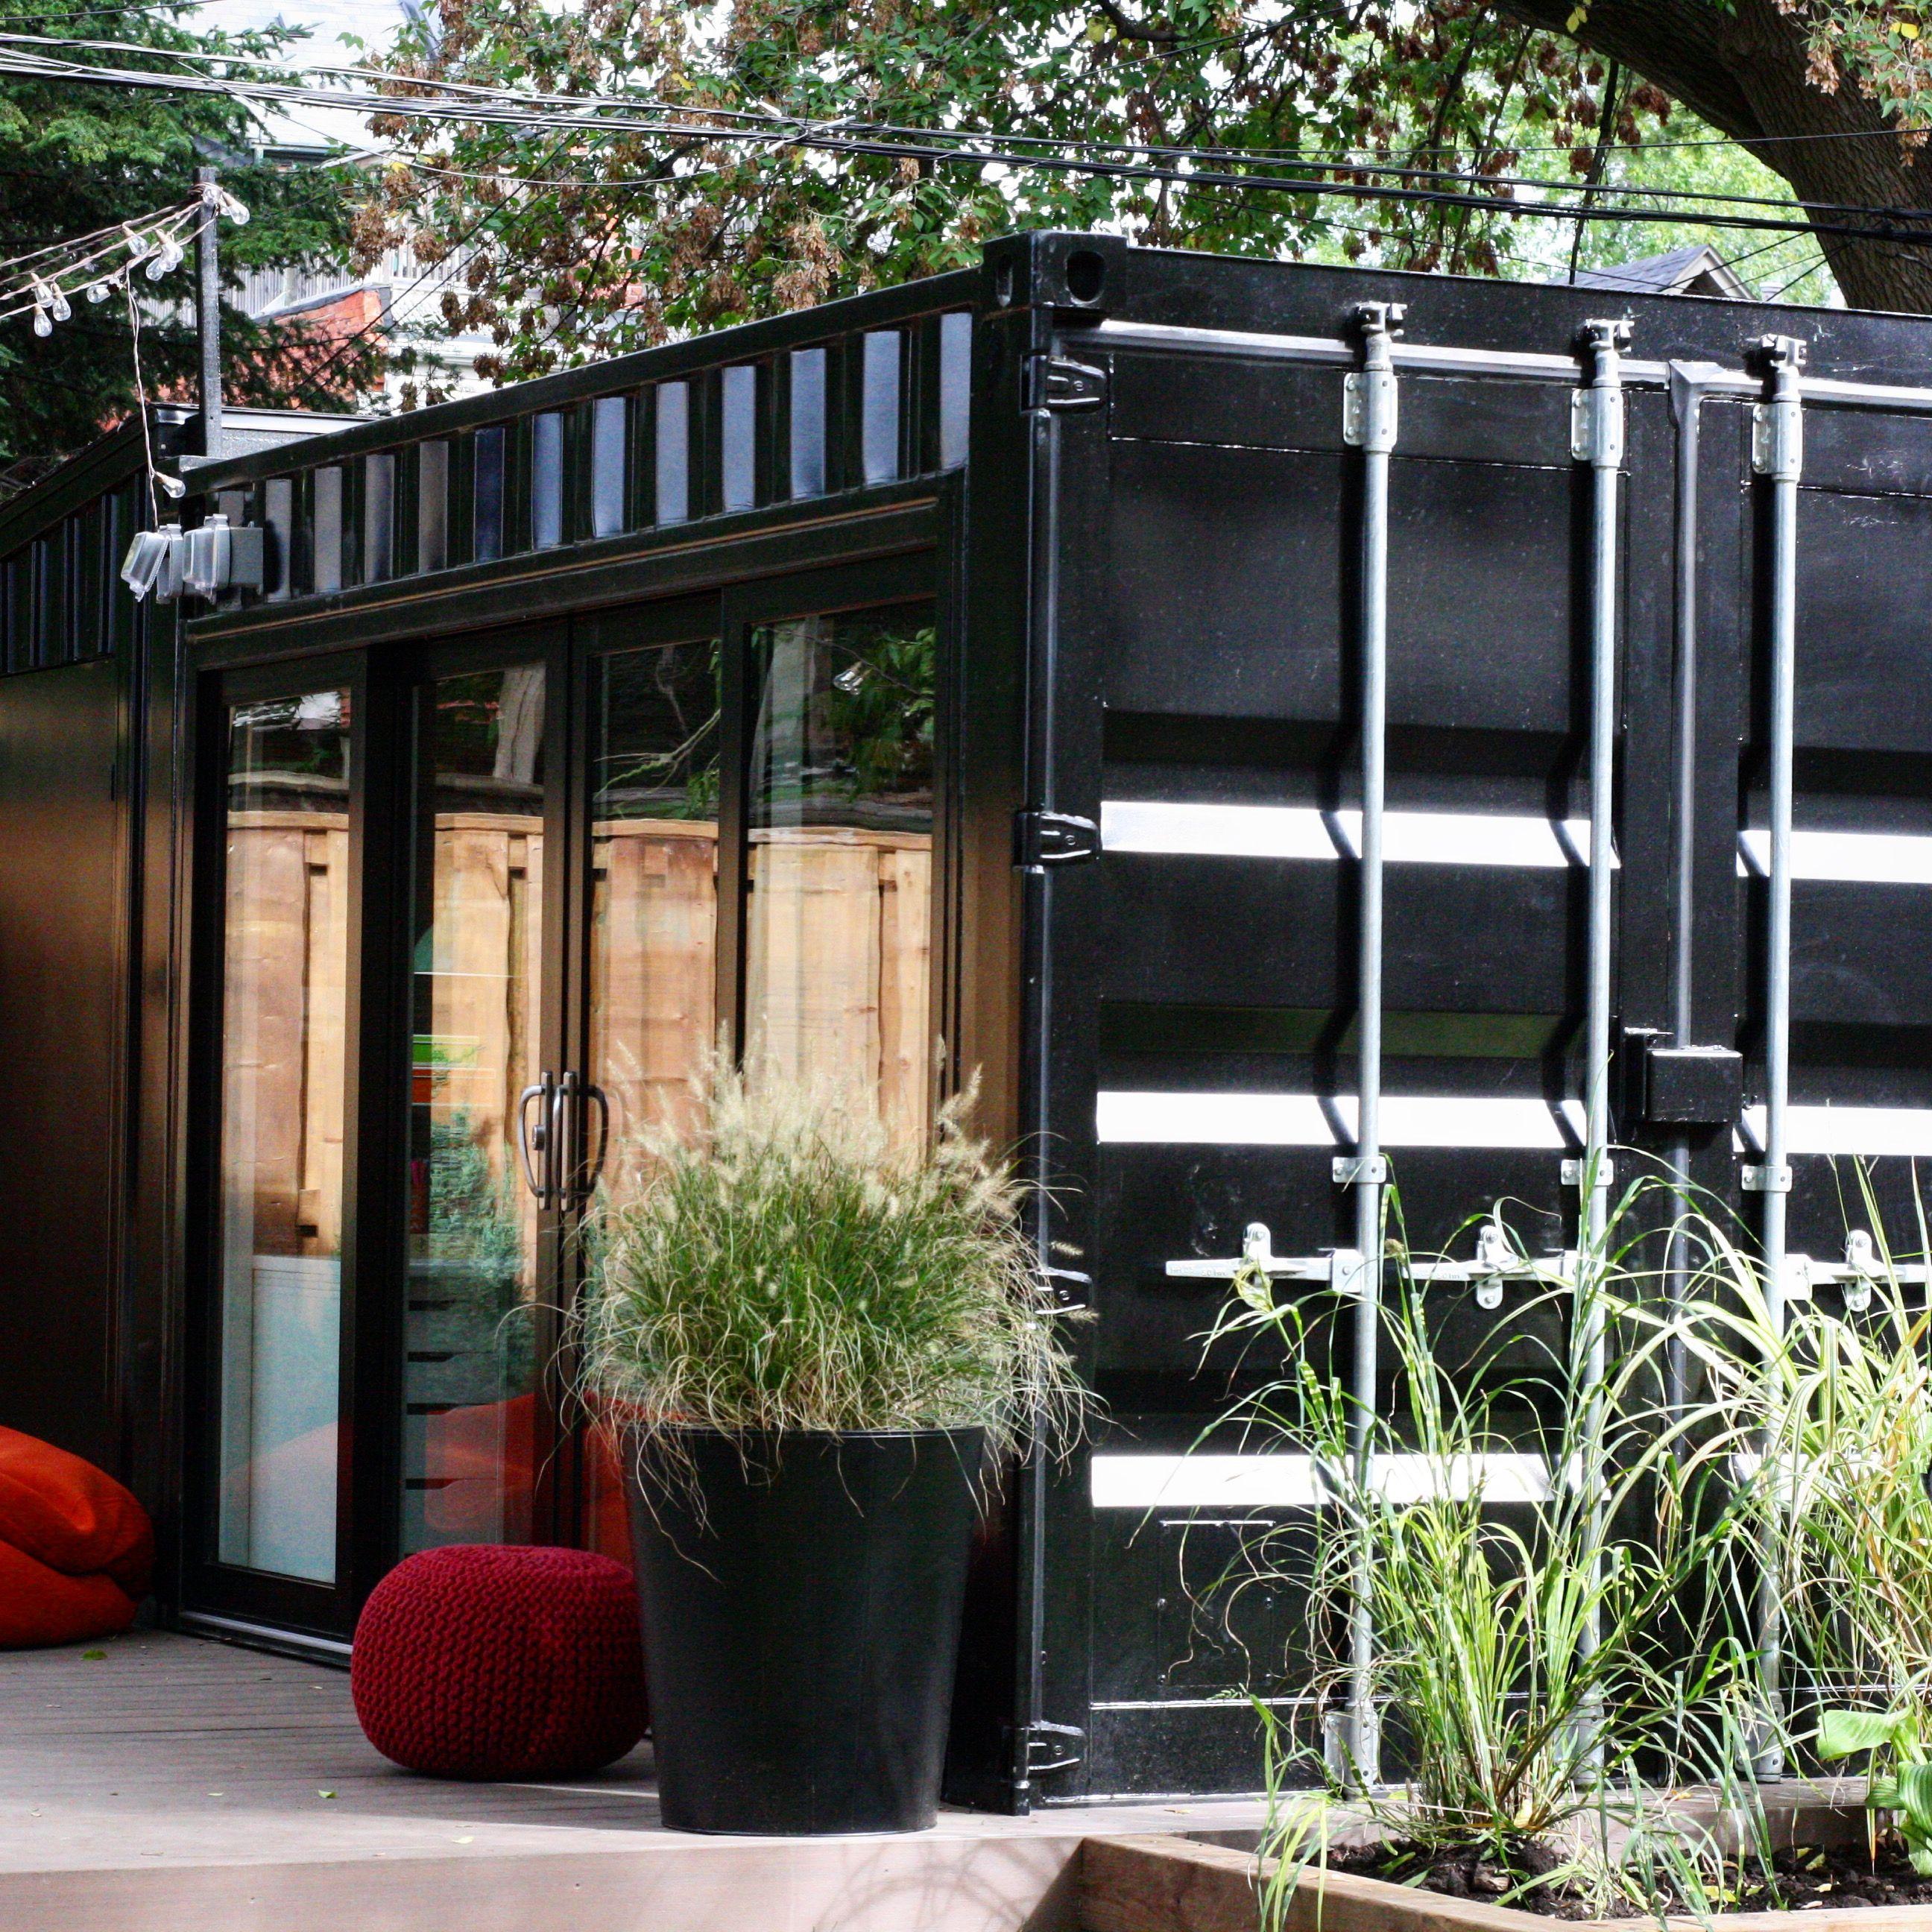 Glasshaus Container Model 20 28 For Hgtv Backyard Builds Glasshaus